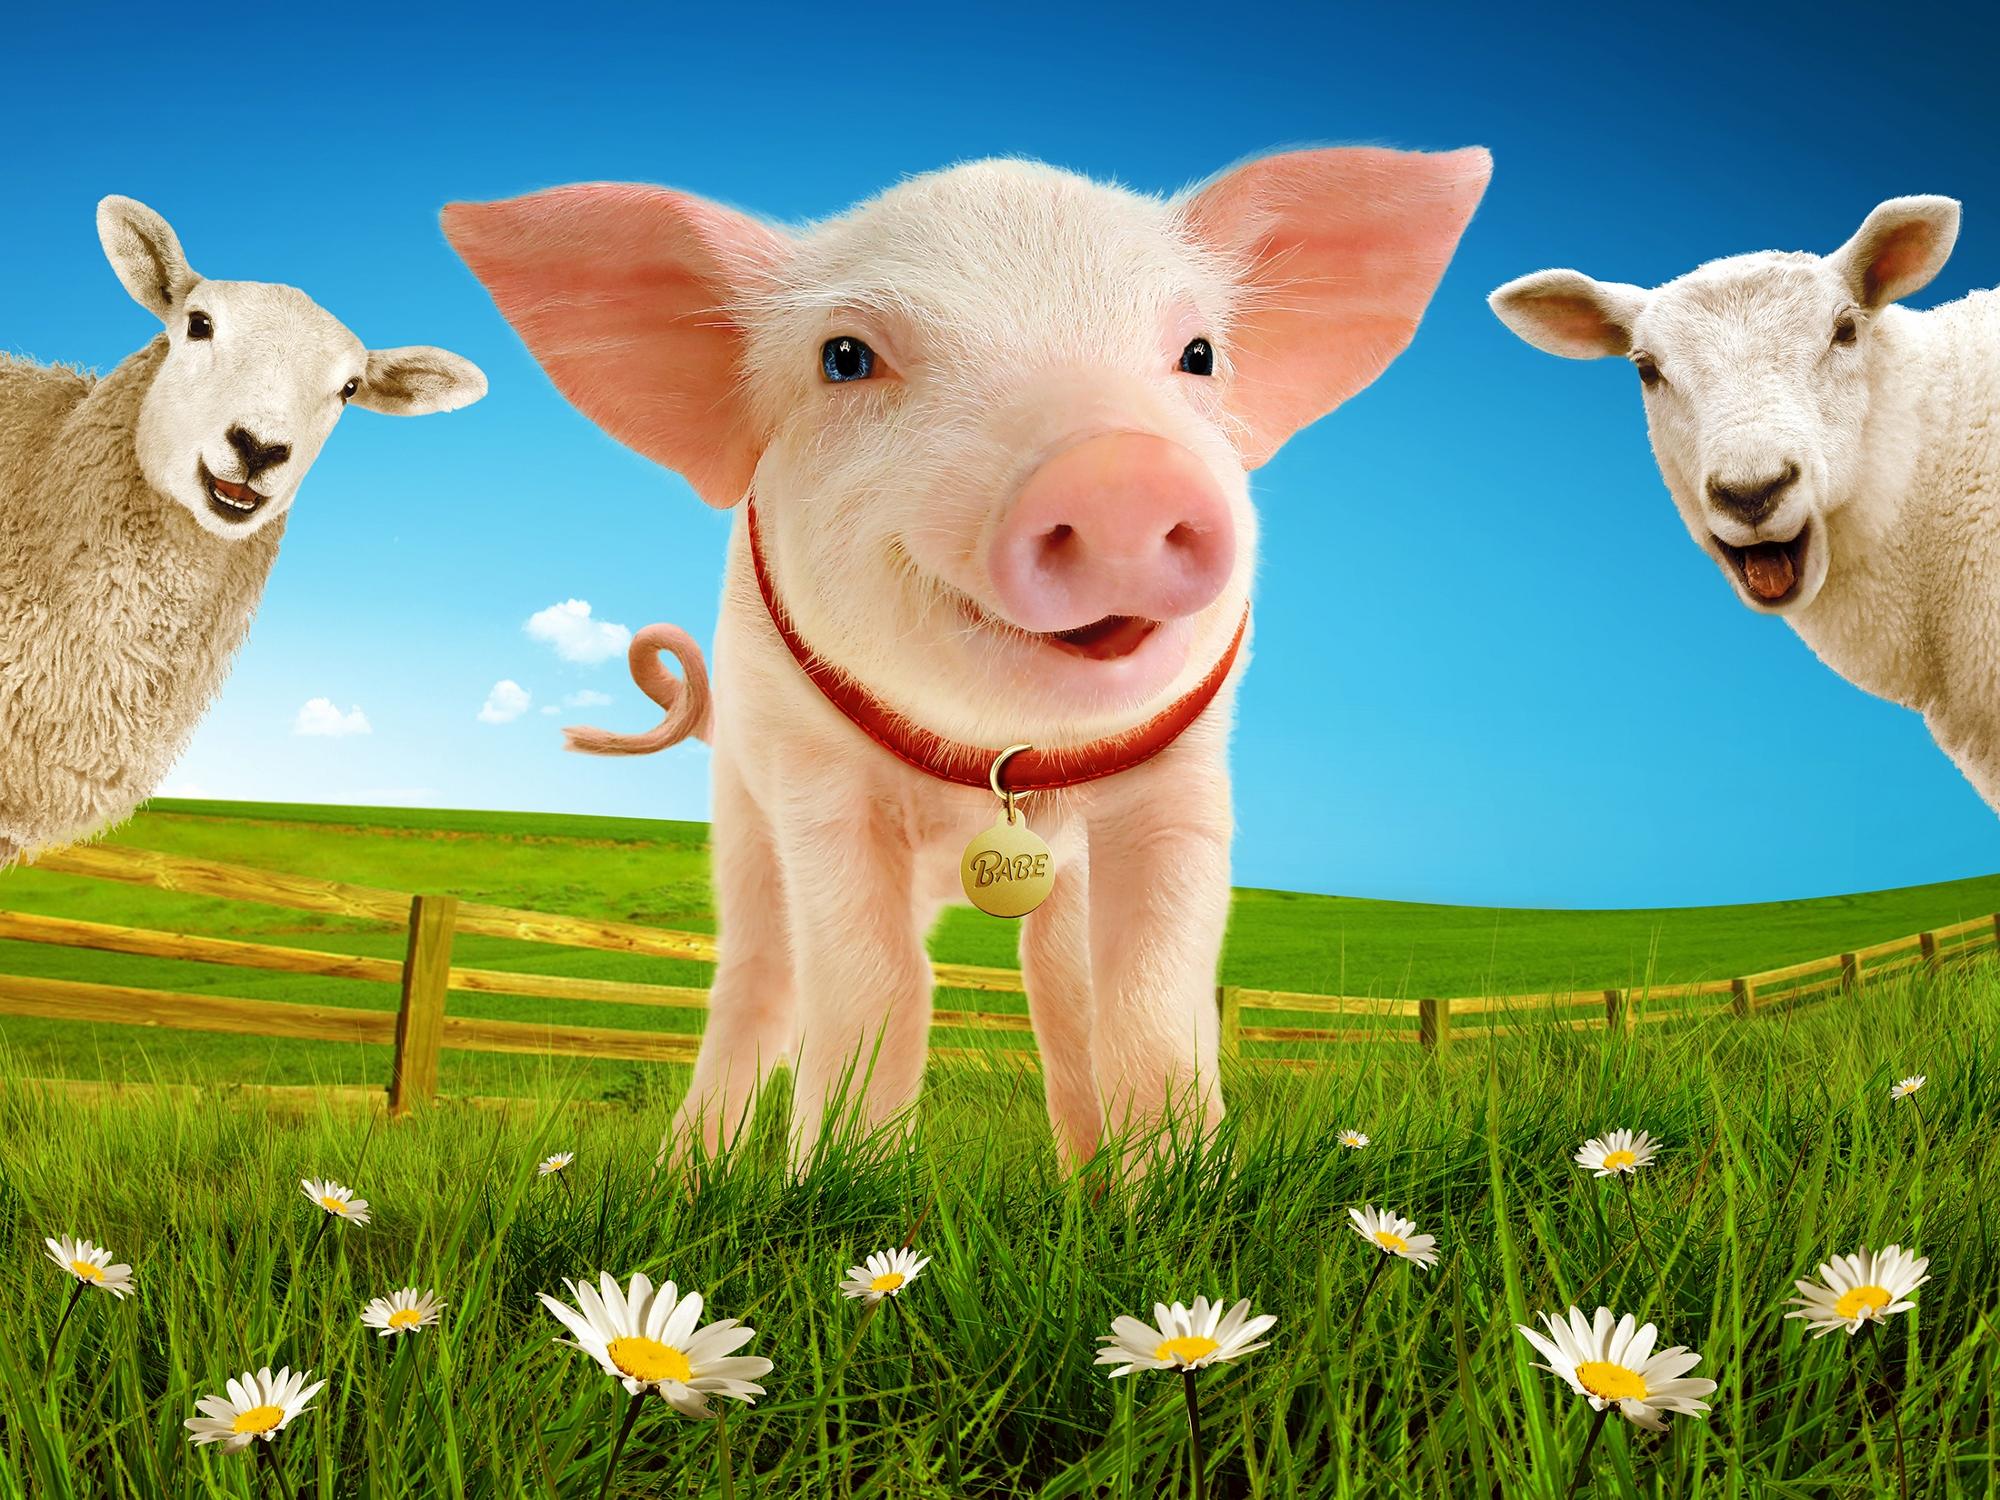 Babe%2c The Sheep-Pig - Landscape image.jpg